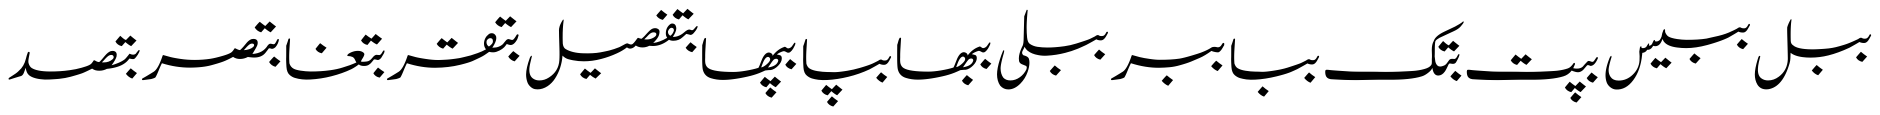 Jameel Khushkhat-LK